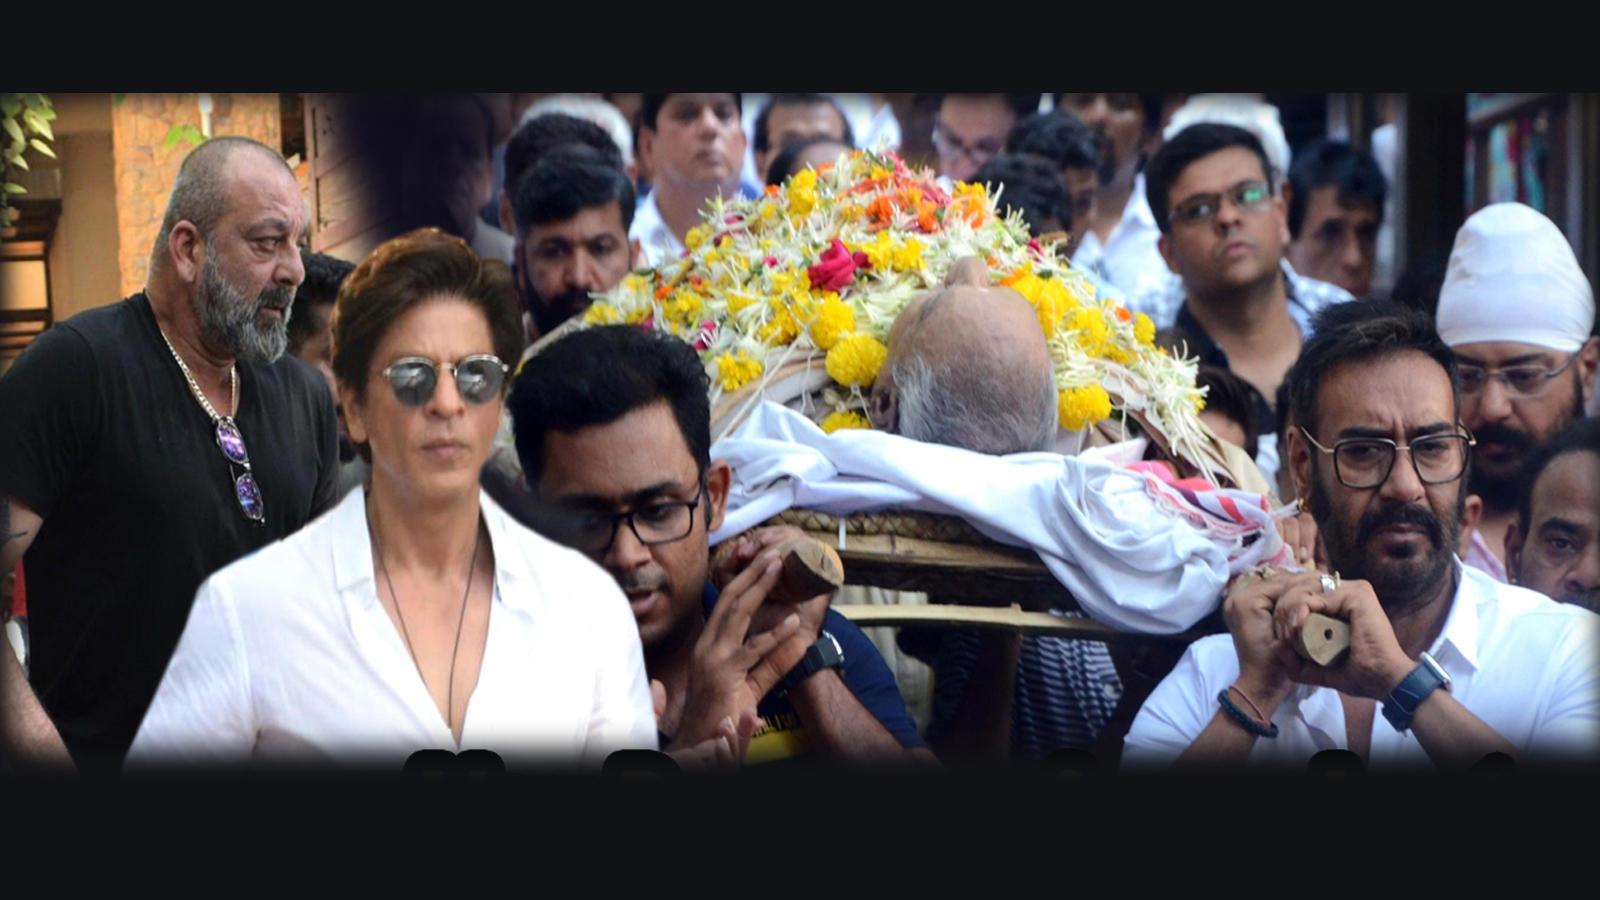 Ajay Devgn performs last rites of father Veeru Devgan, Bollywood bids  tearful adieu